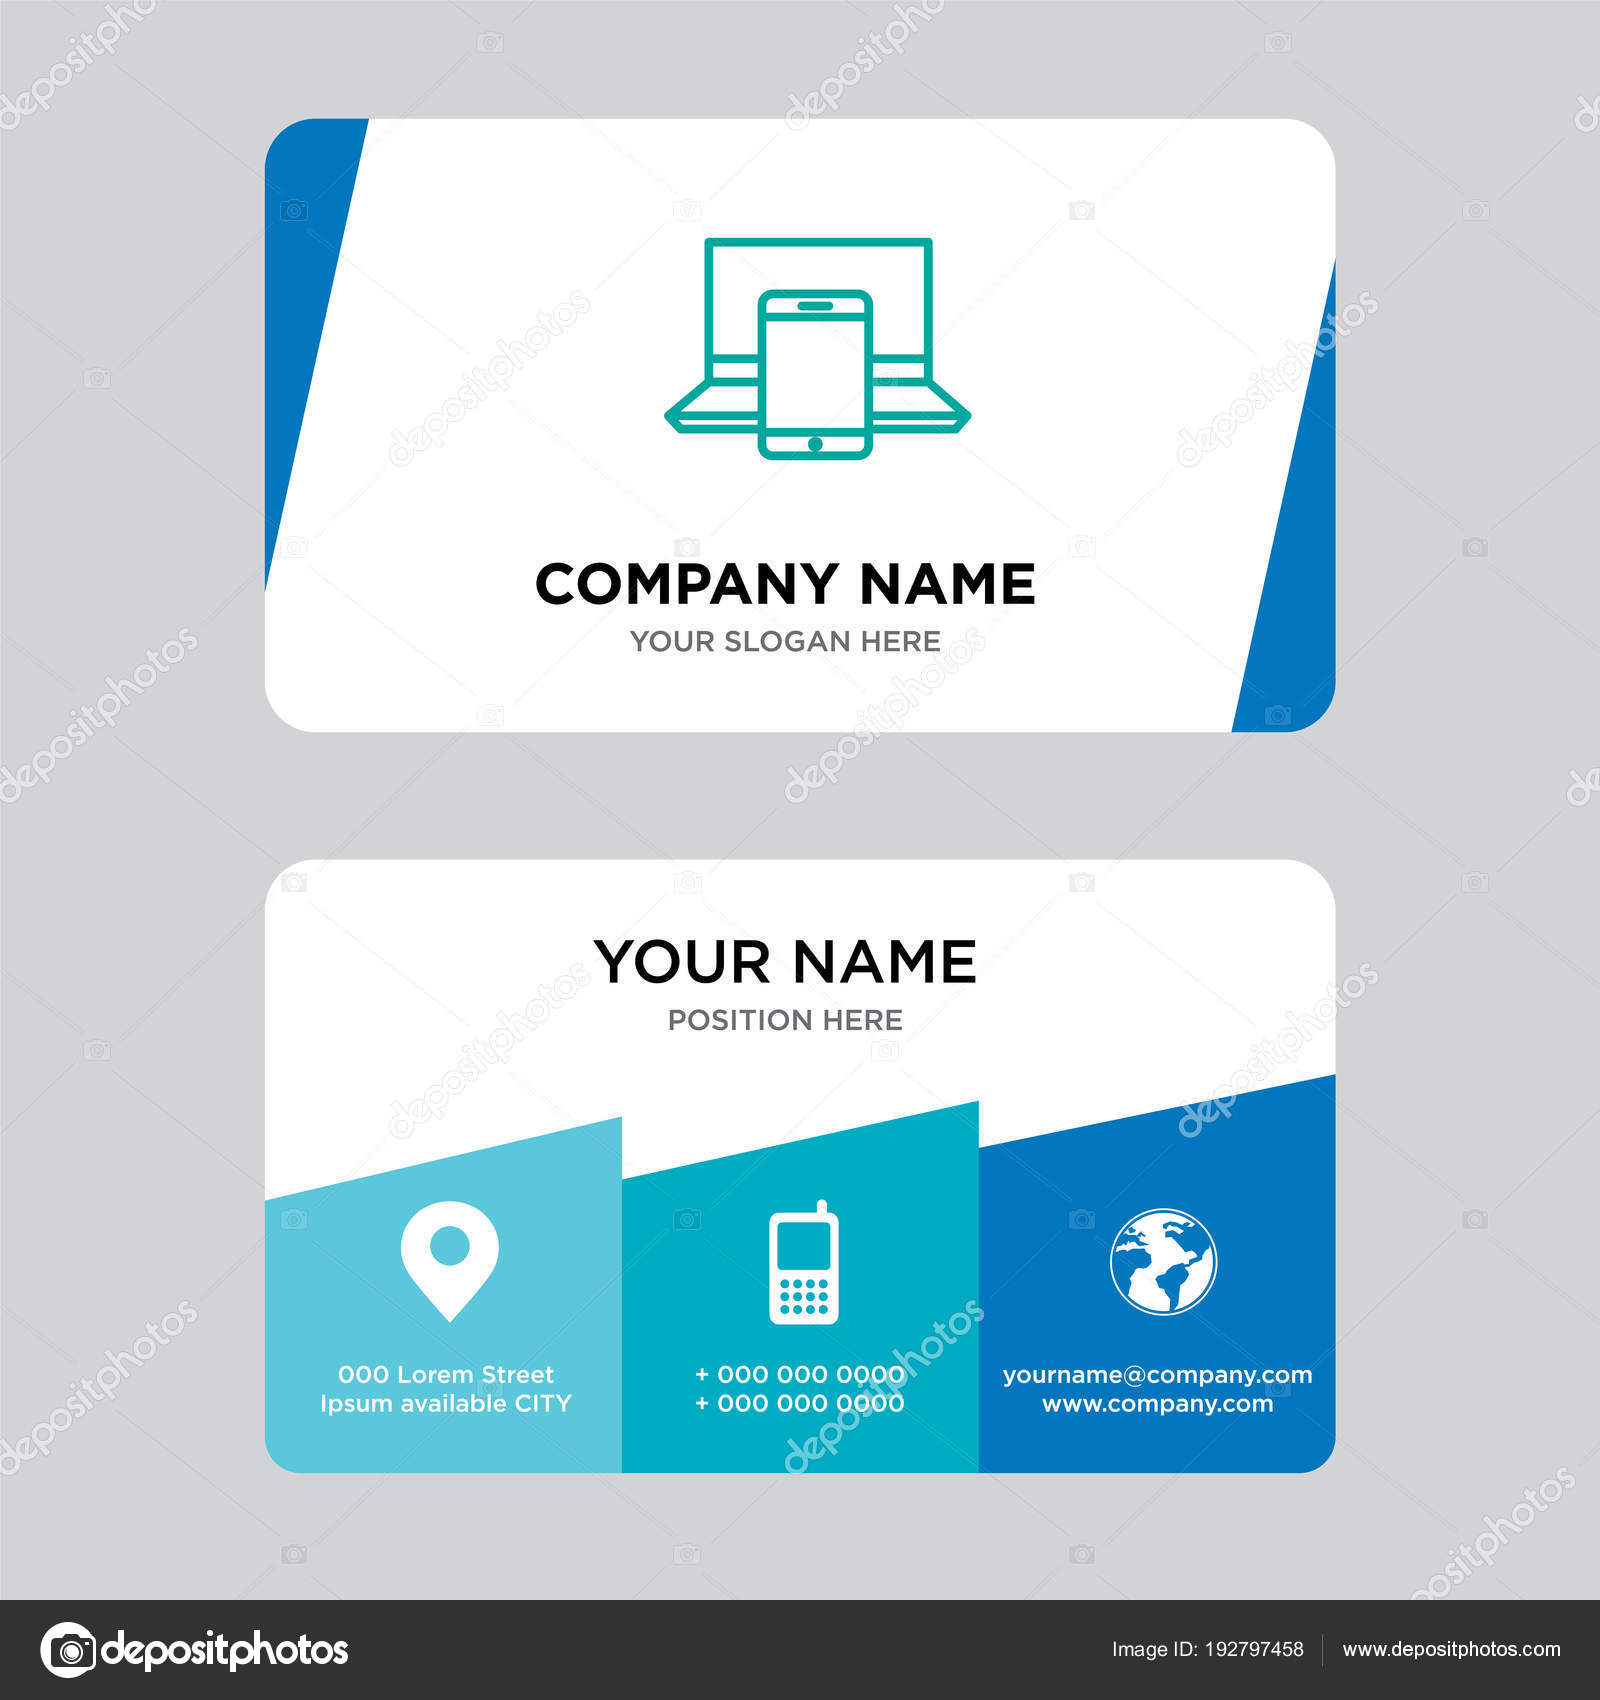 electronics business card design template — Stock Vector ...